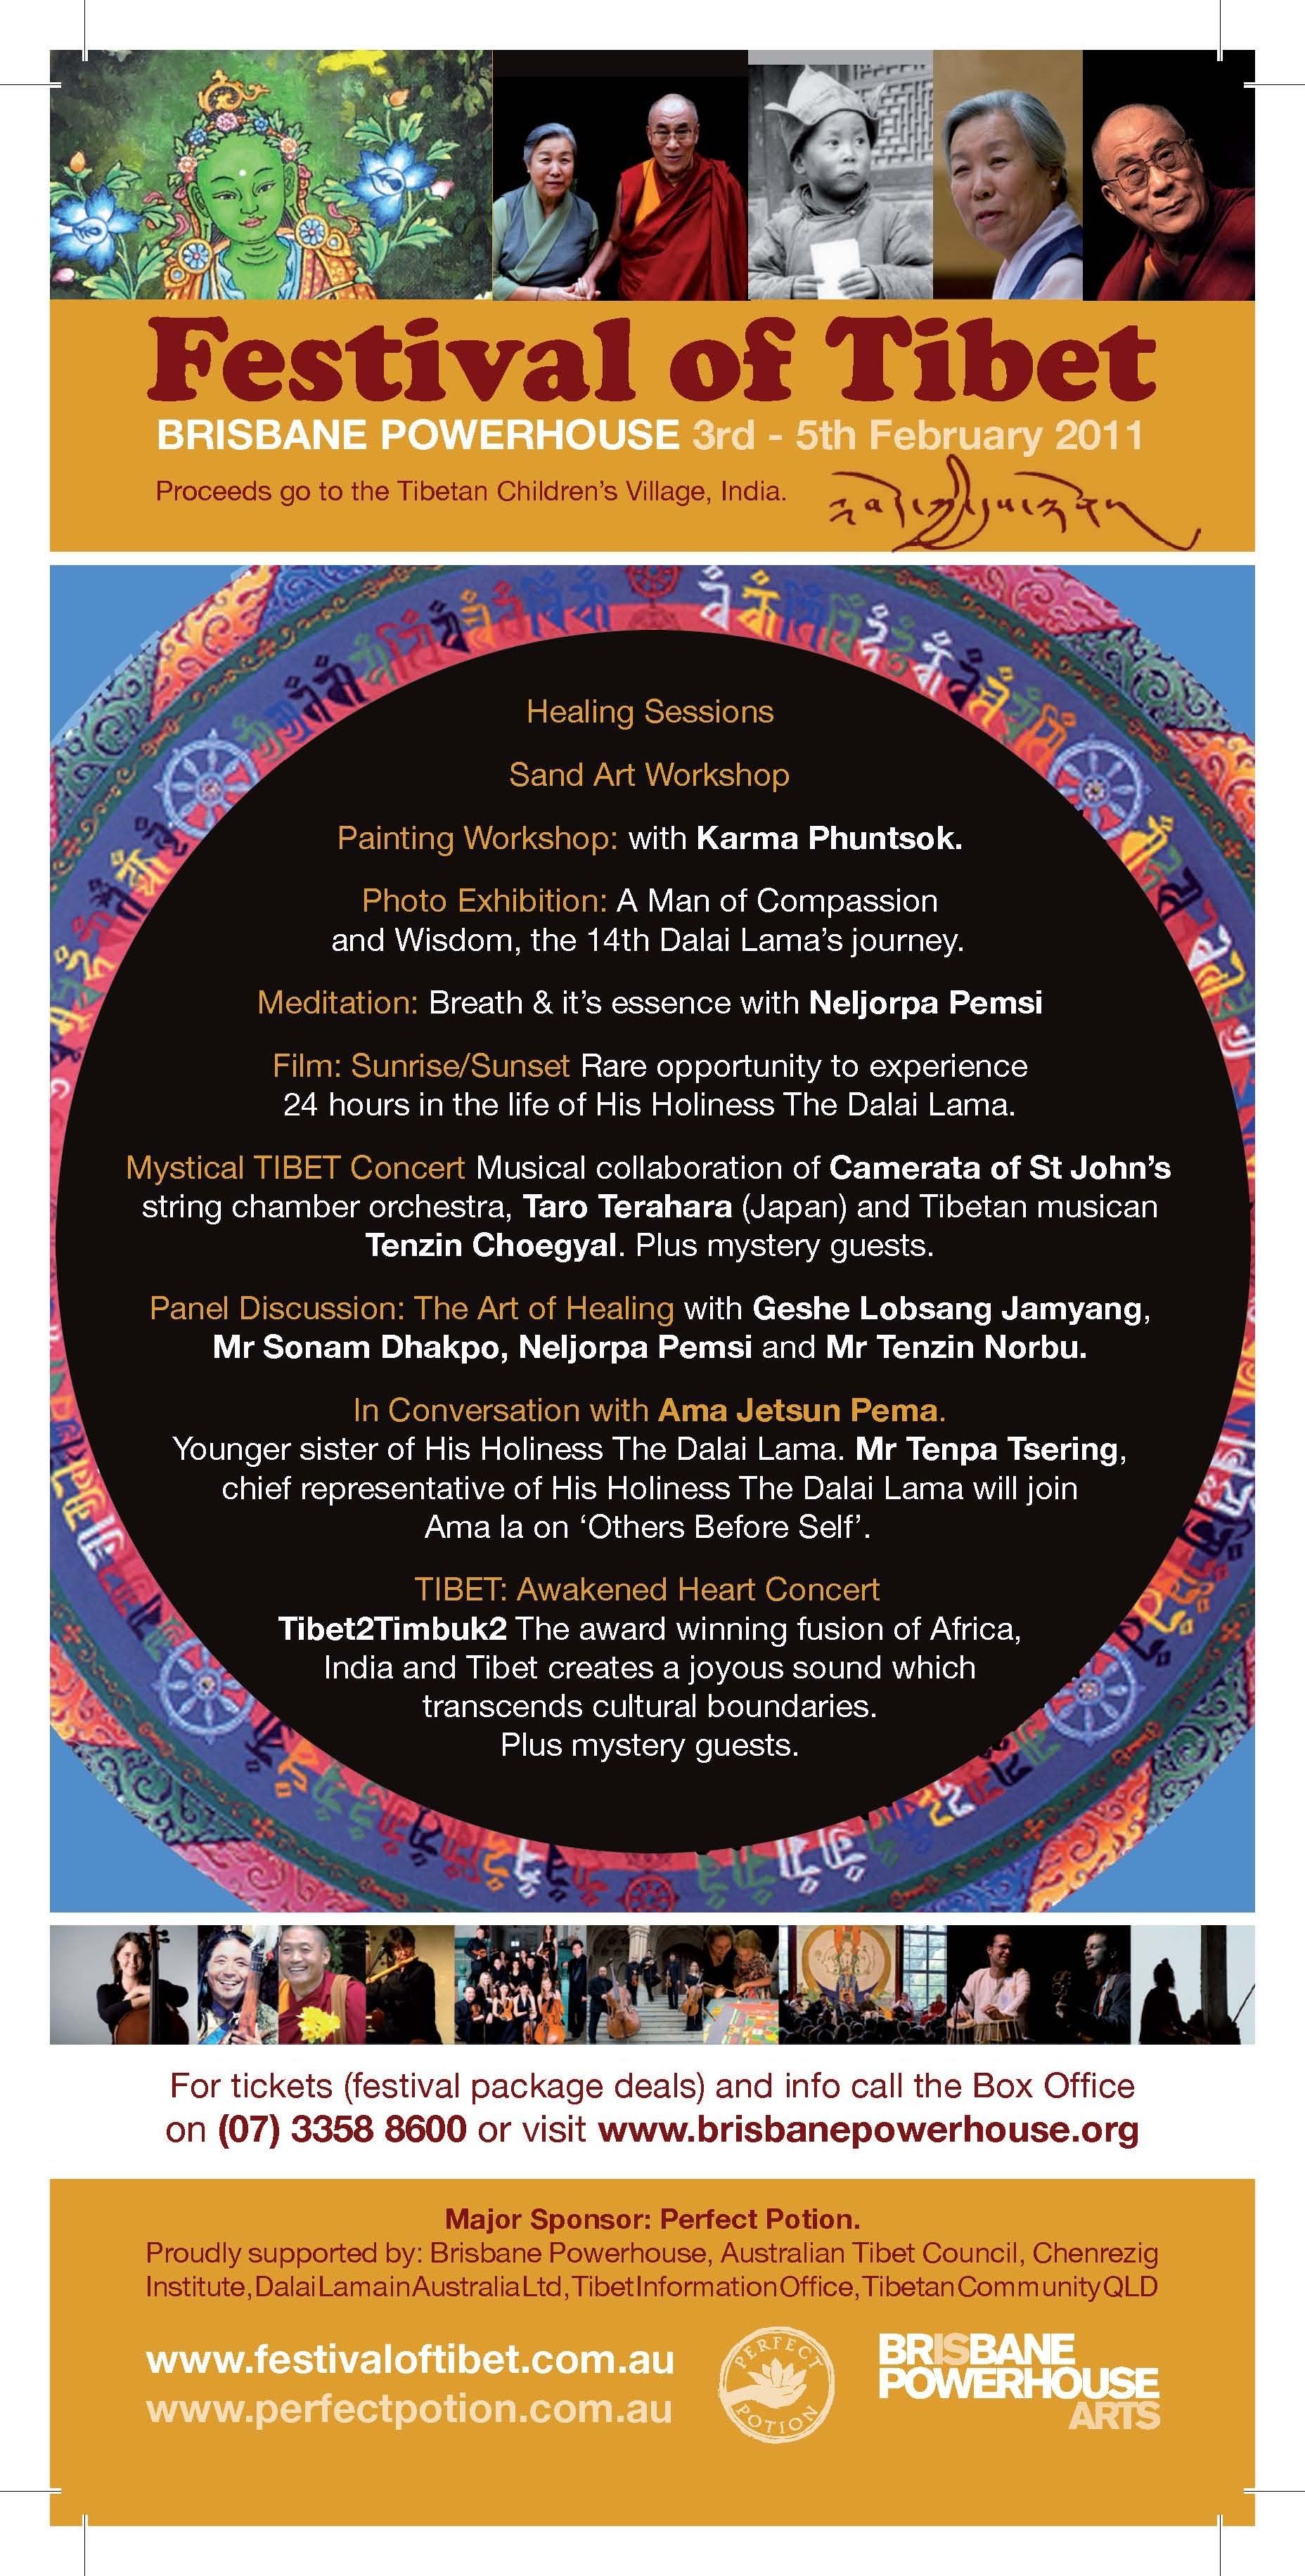 sydney festival 2011 lineup - photo#35